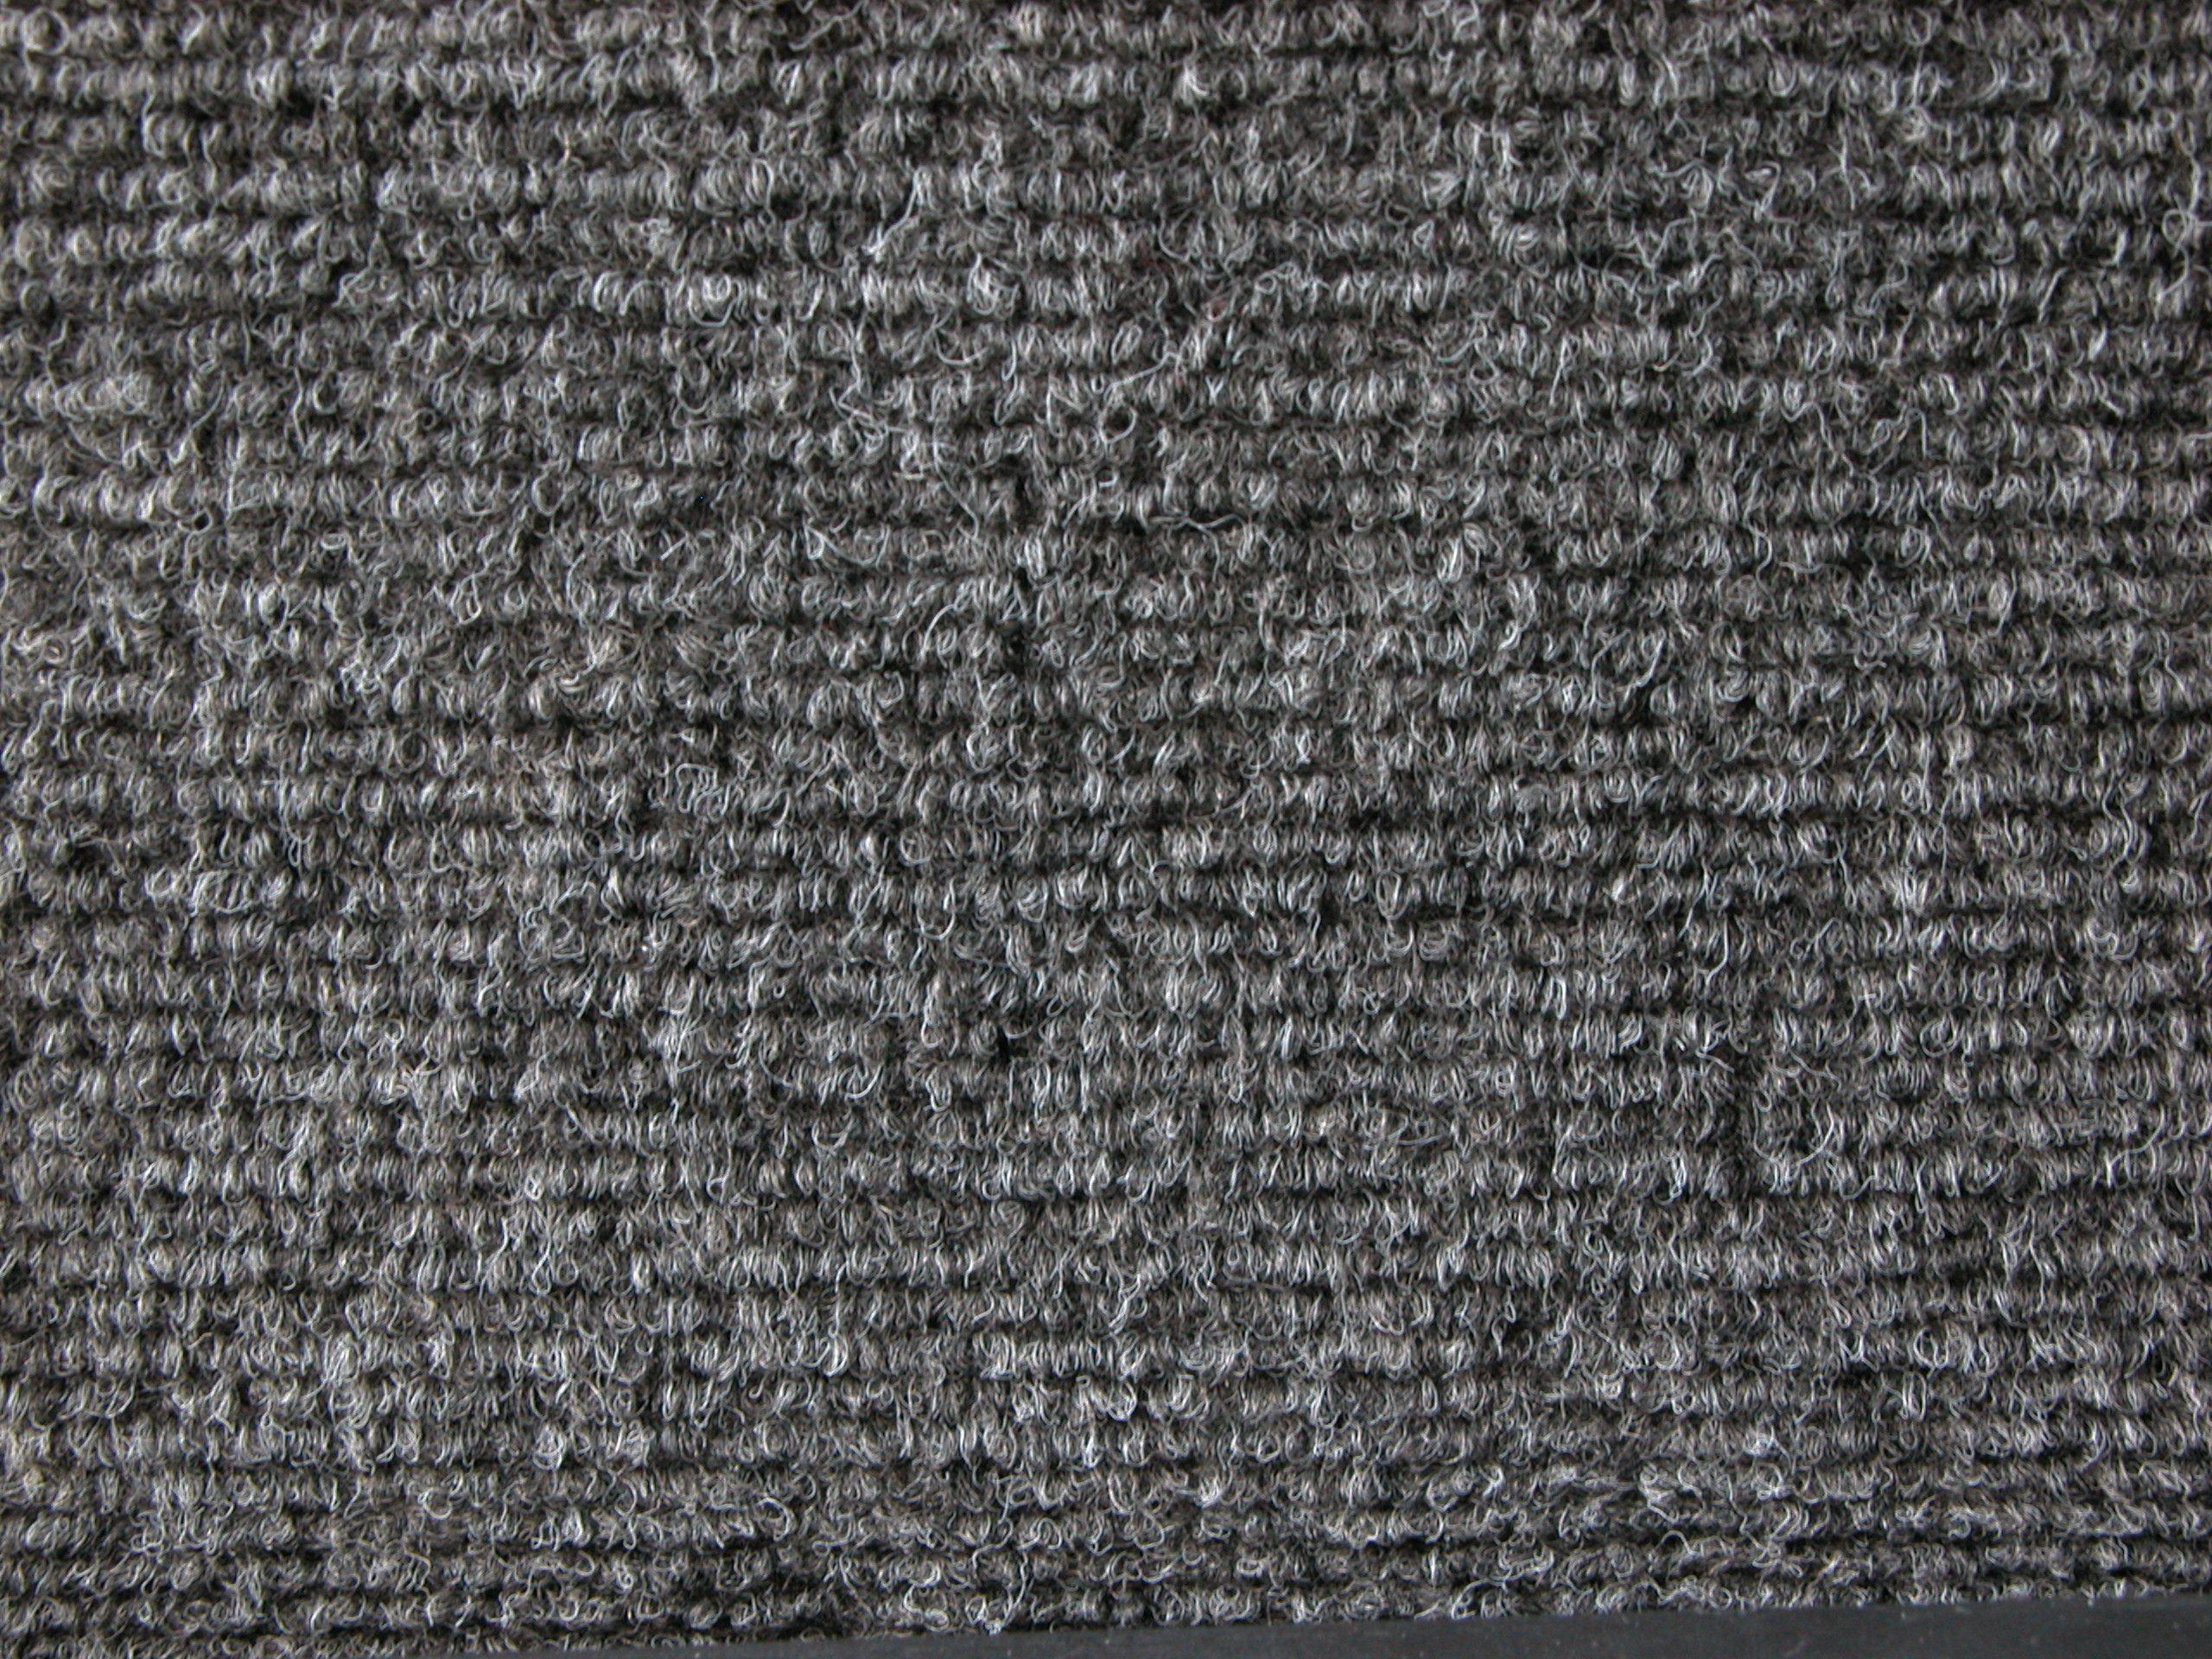 imageafter photo fabrics textile floor pattern texture gray carpet